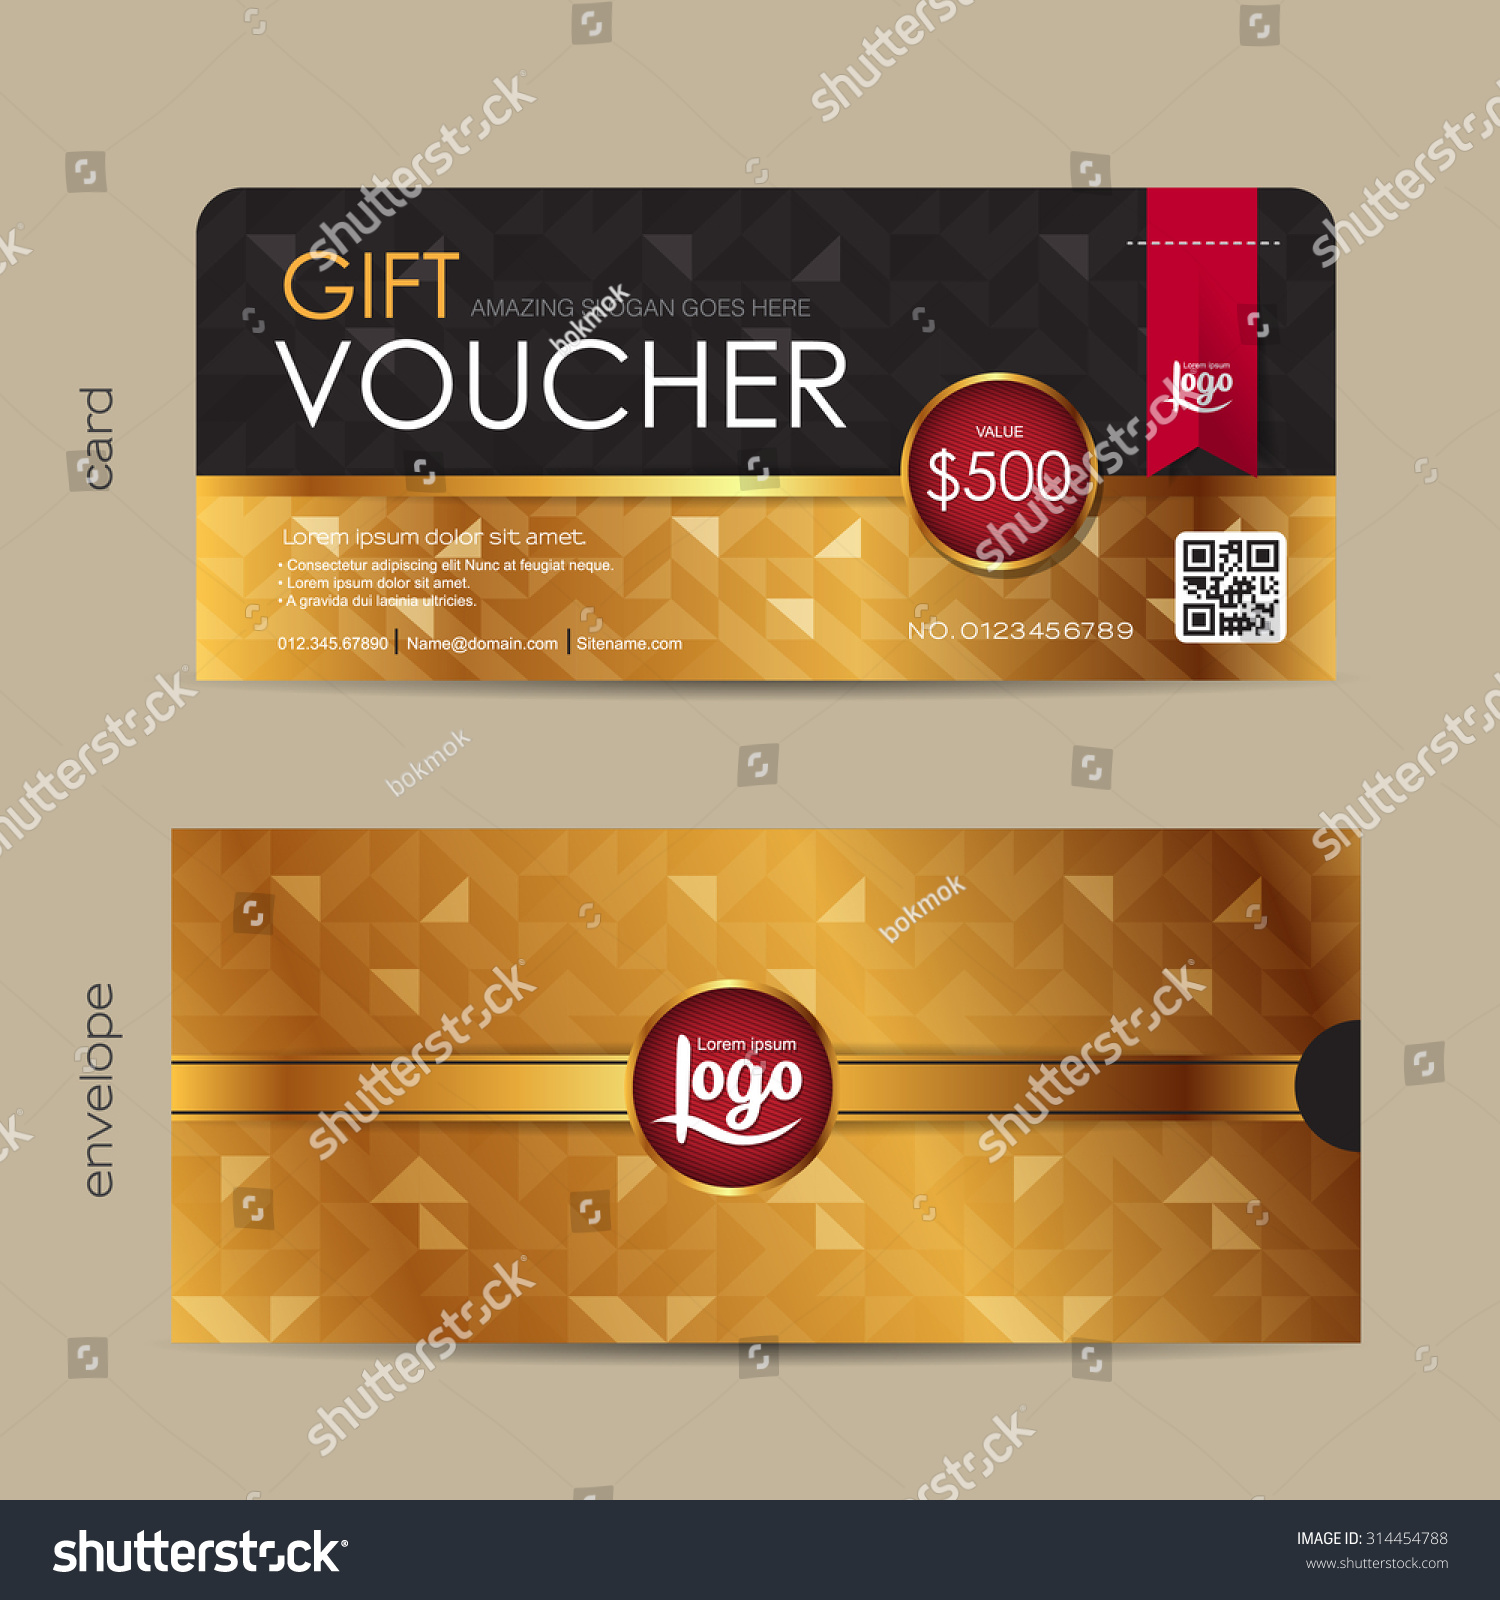 Gift Voucher Template Premium Pattern Envelope Vector – Create a Voucher Template